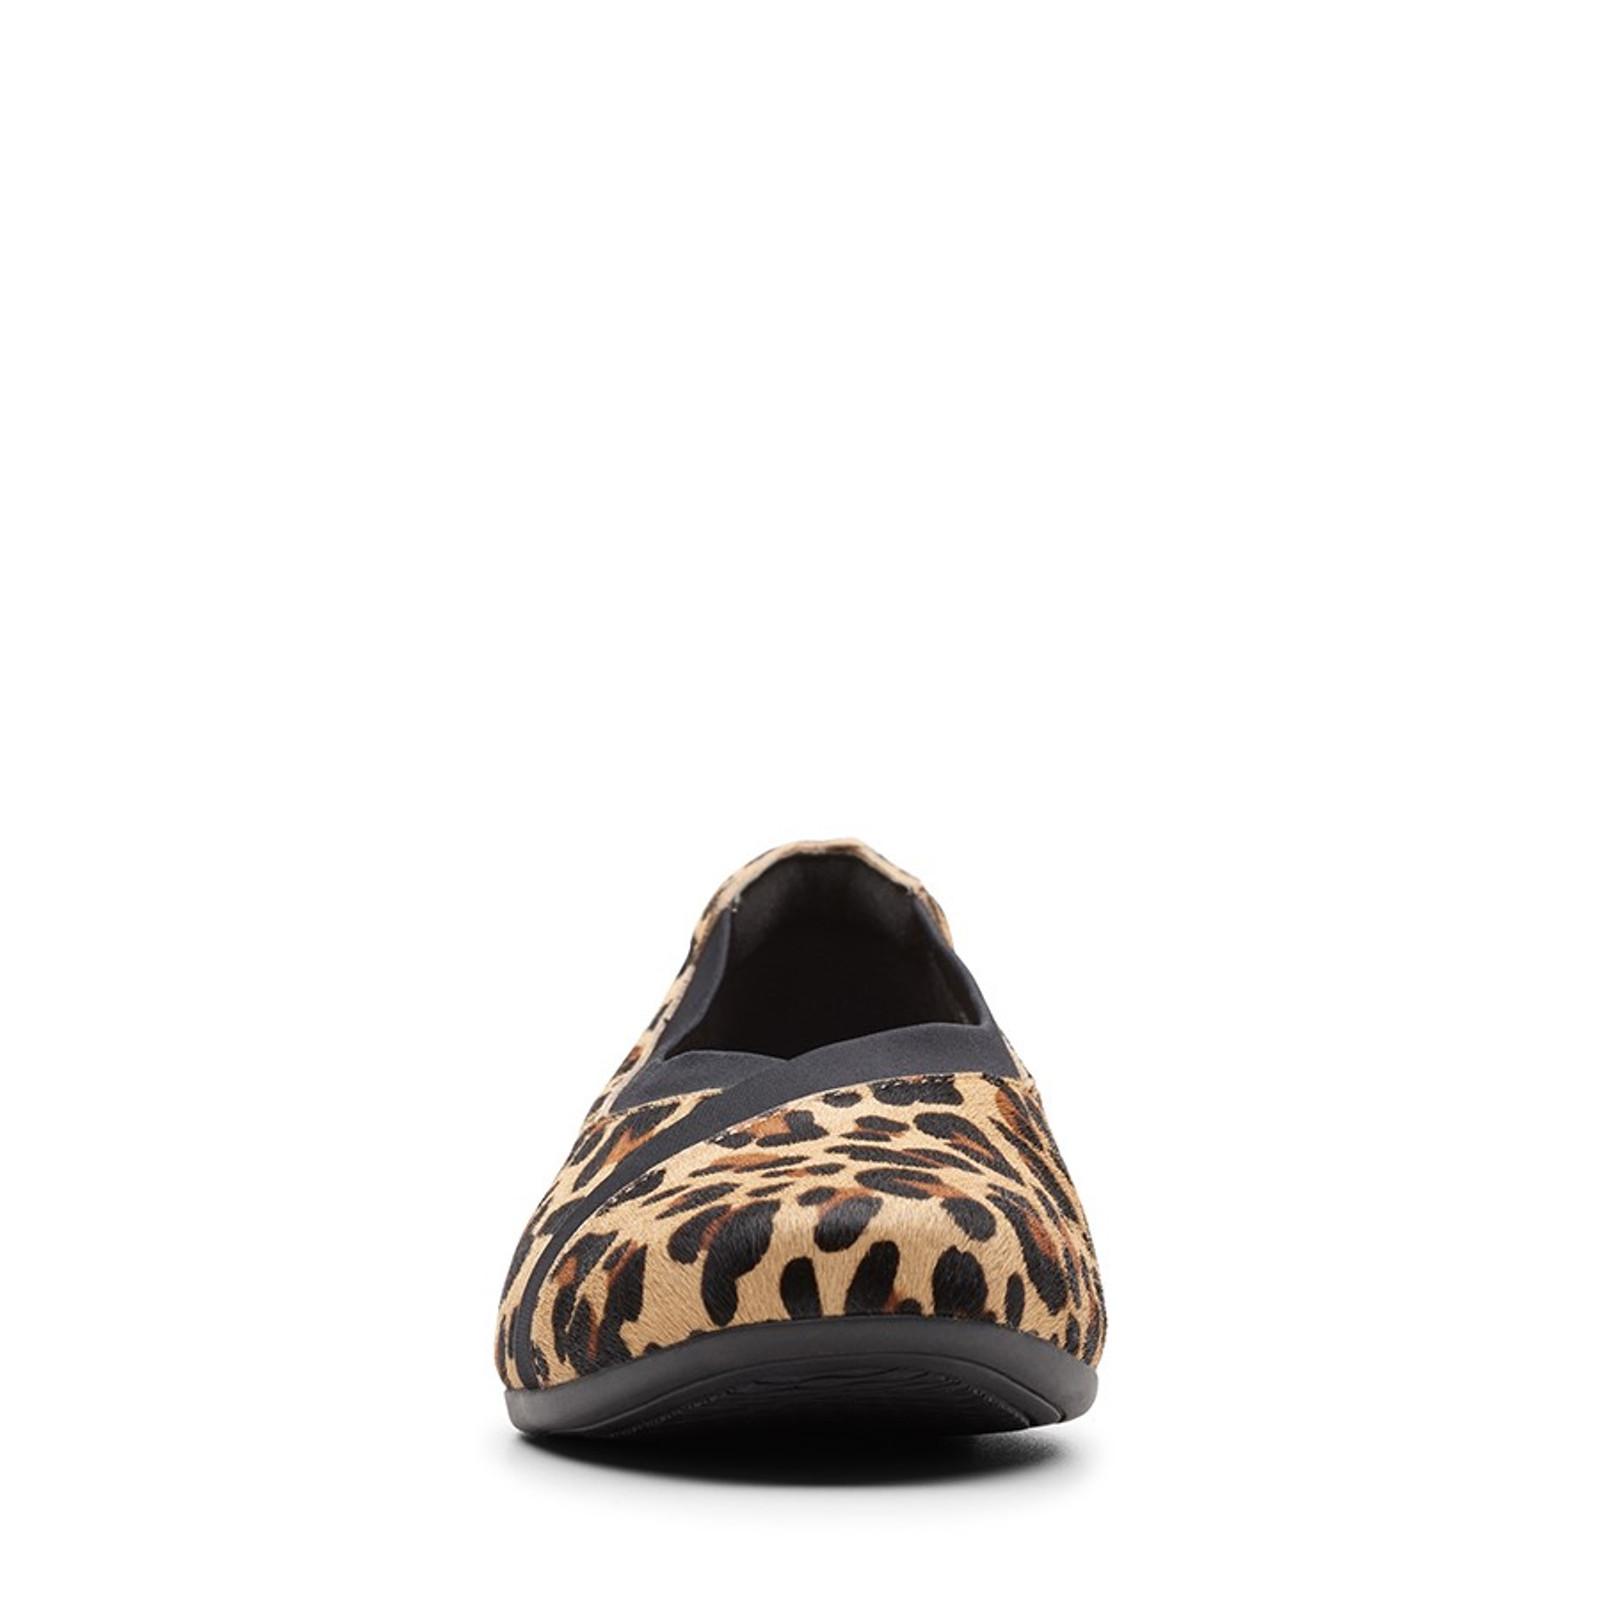 Clarks Womens UN DARCEY EASE Leopard Print